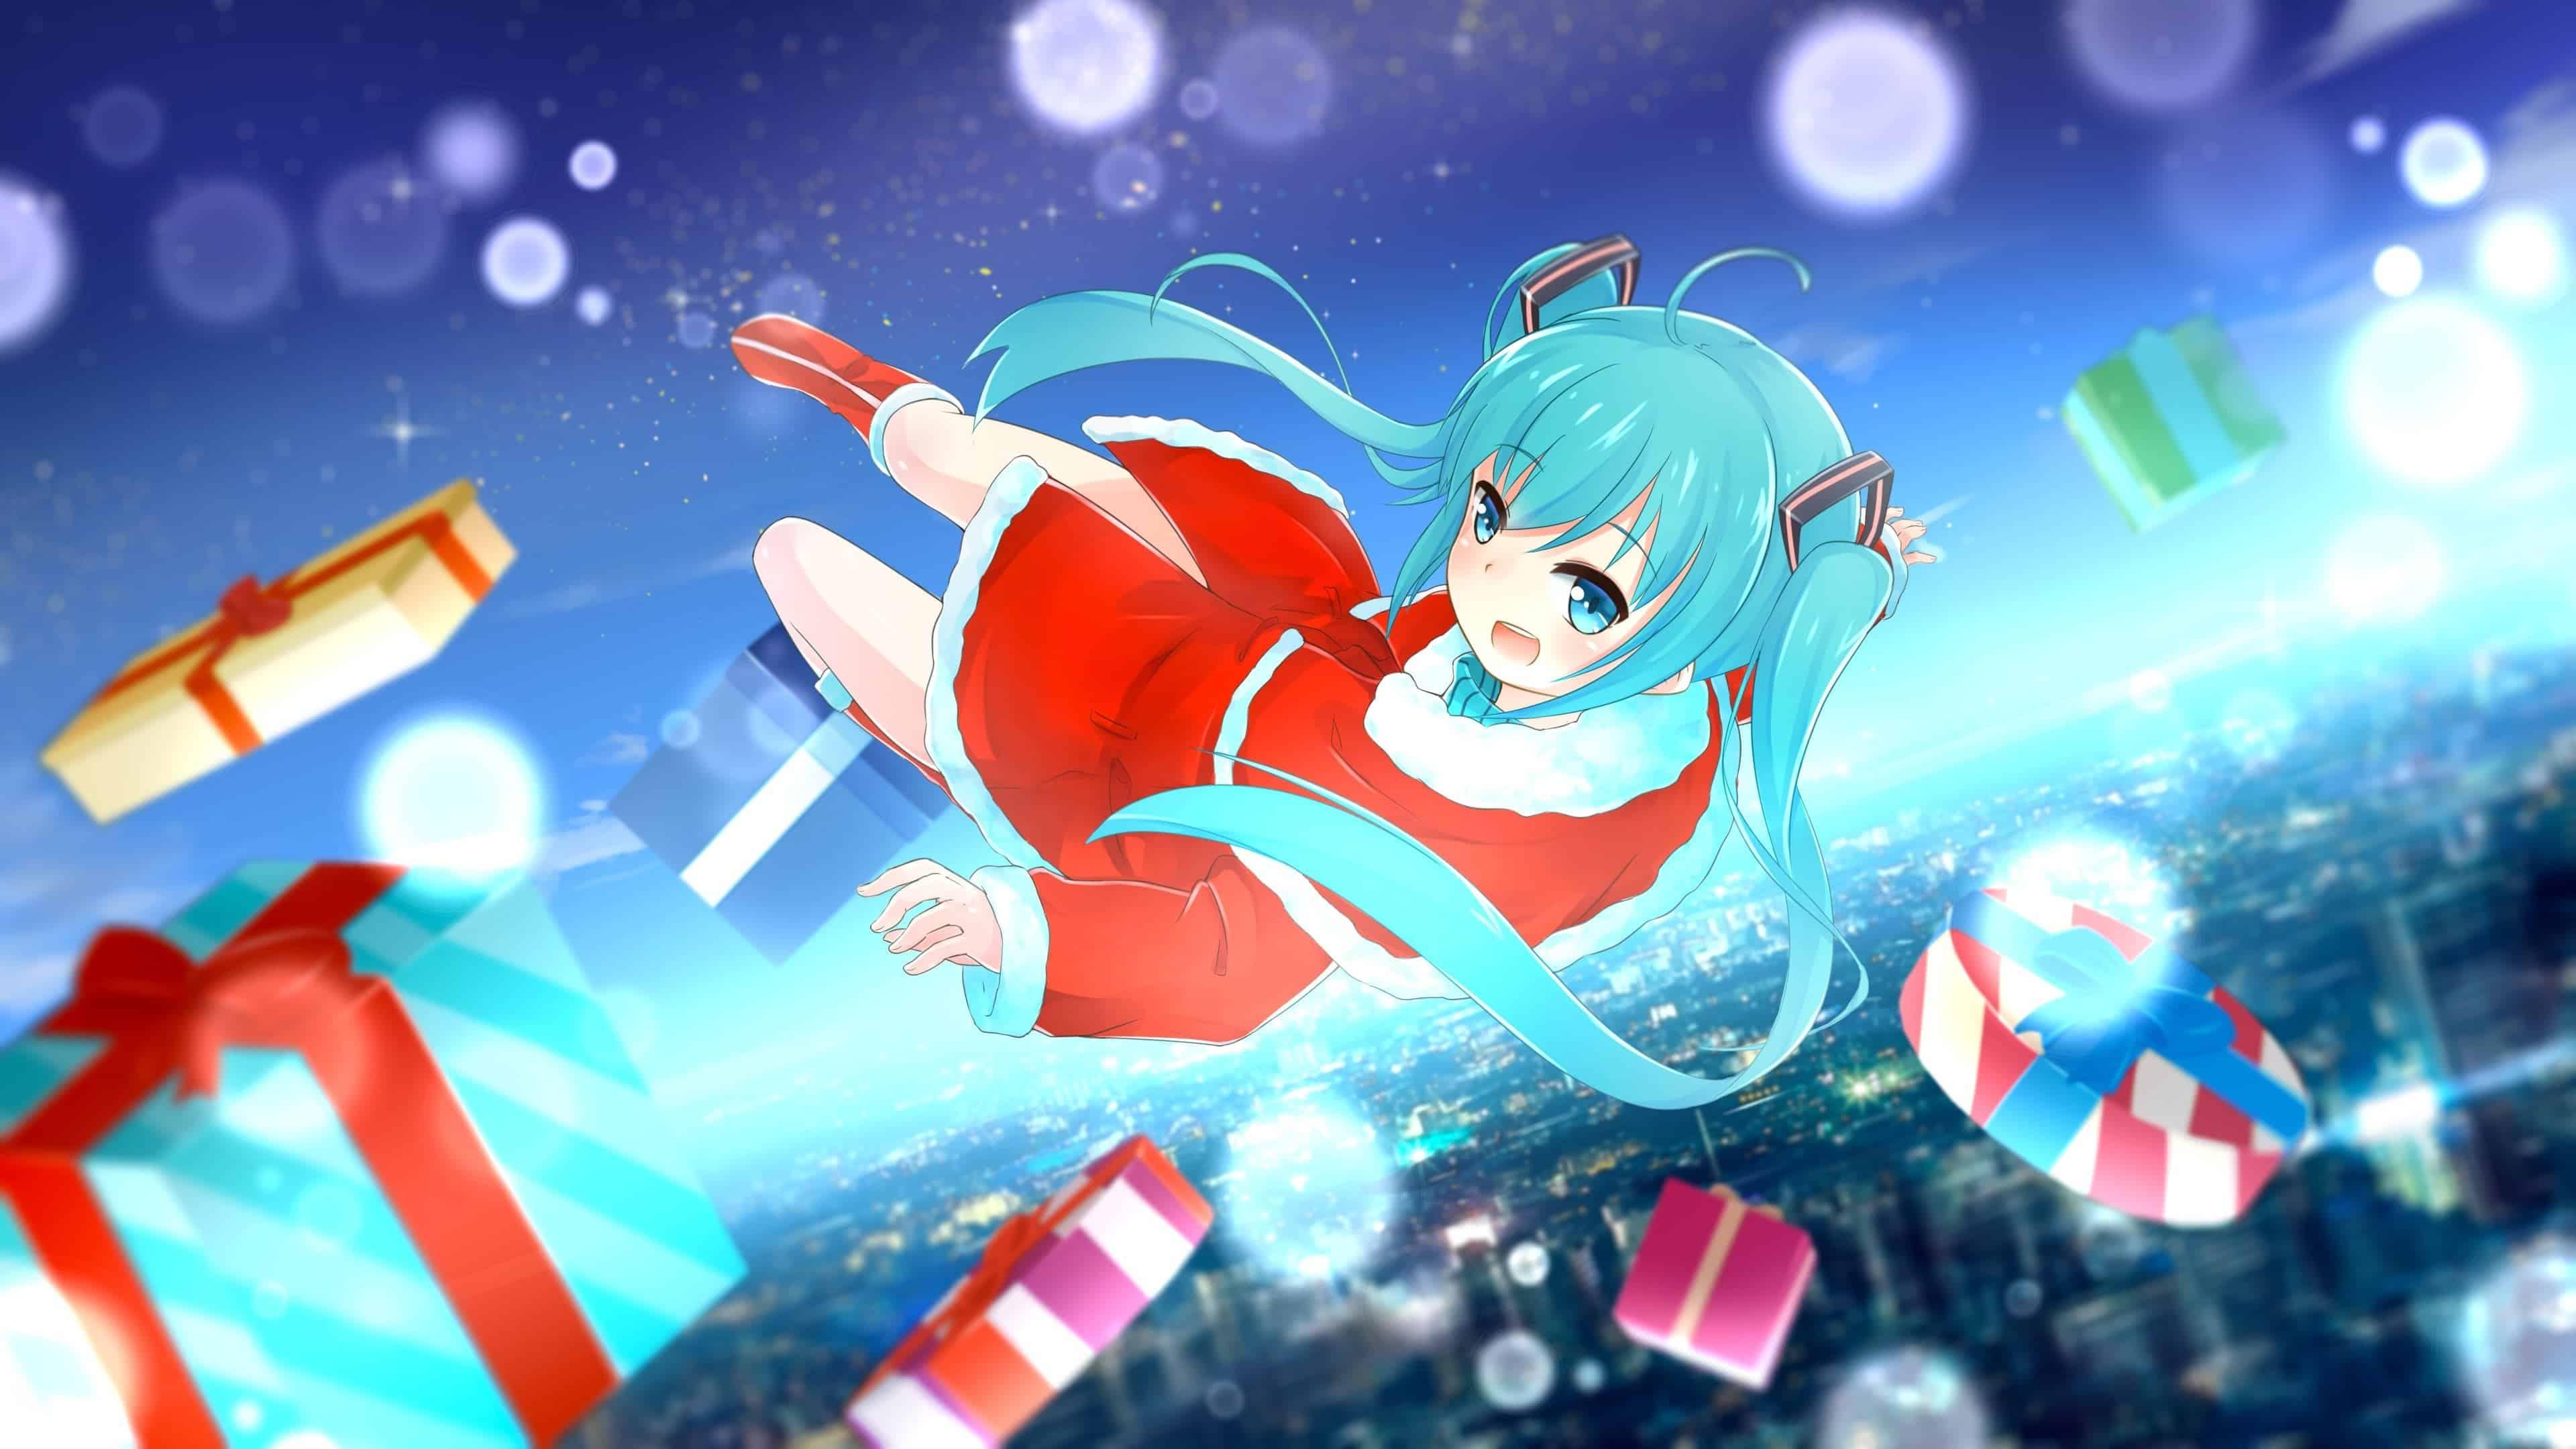 hatsune miku wallpaper,cartoon,sky,anime,fictional character,illustration